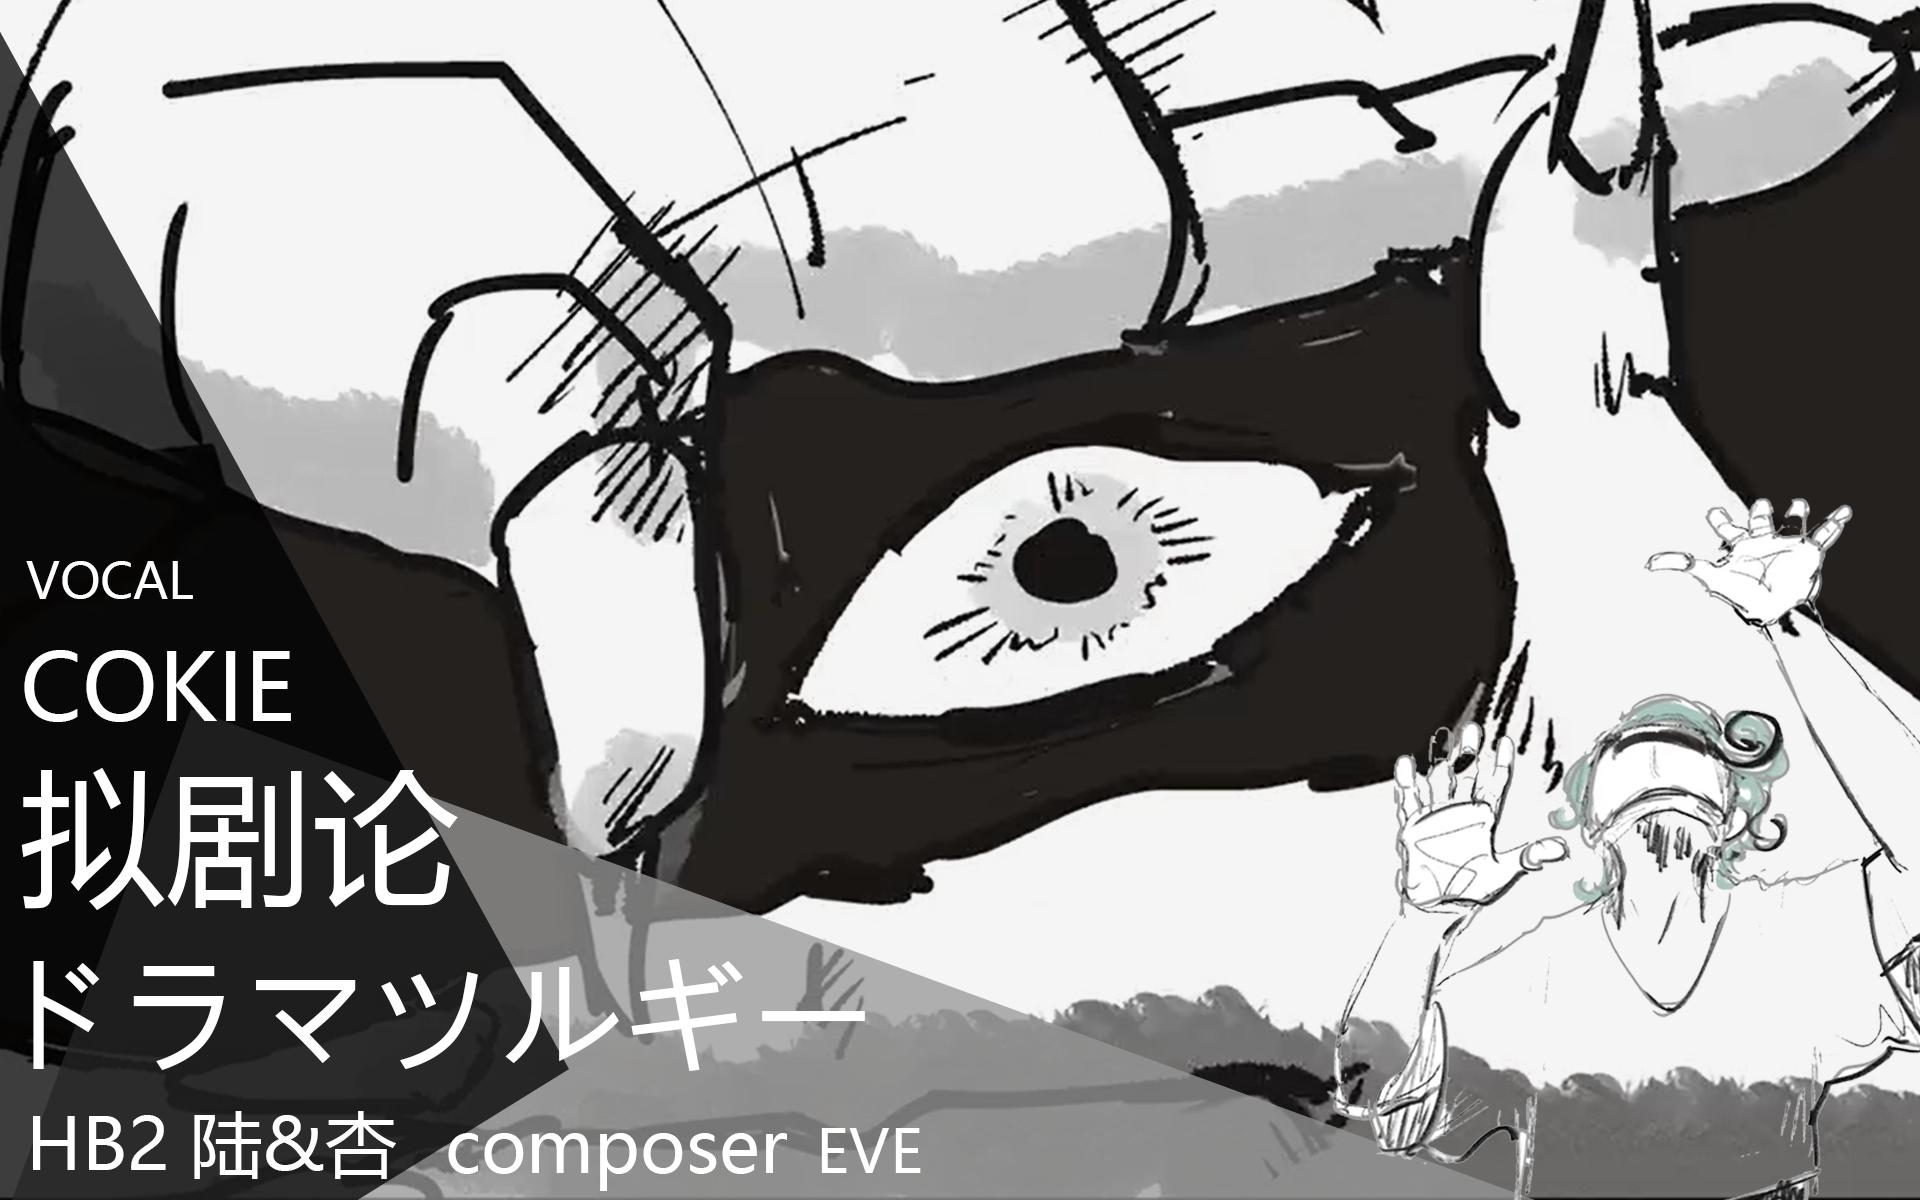 【COKIE翻唱】拟剧论 / ドラマツルギー - Eve HB2 陆&杏